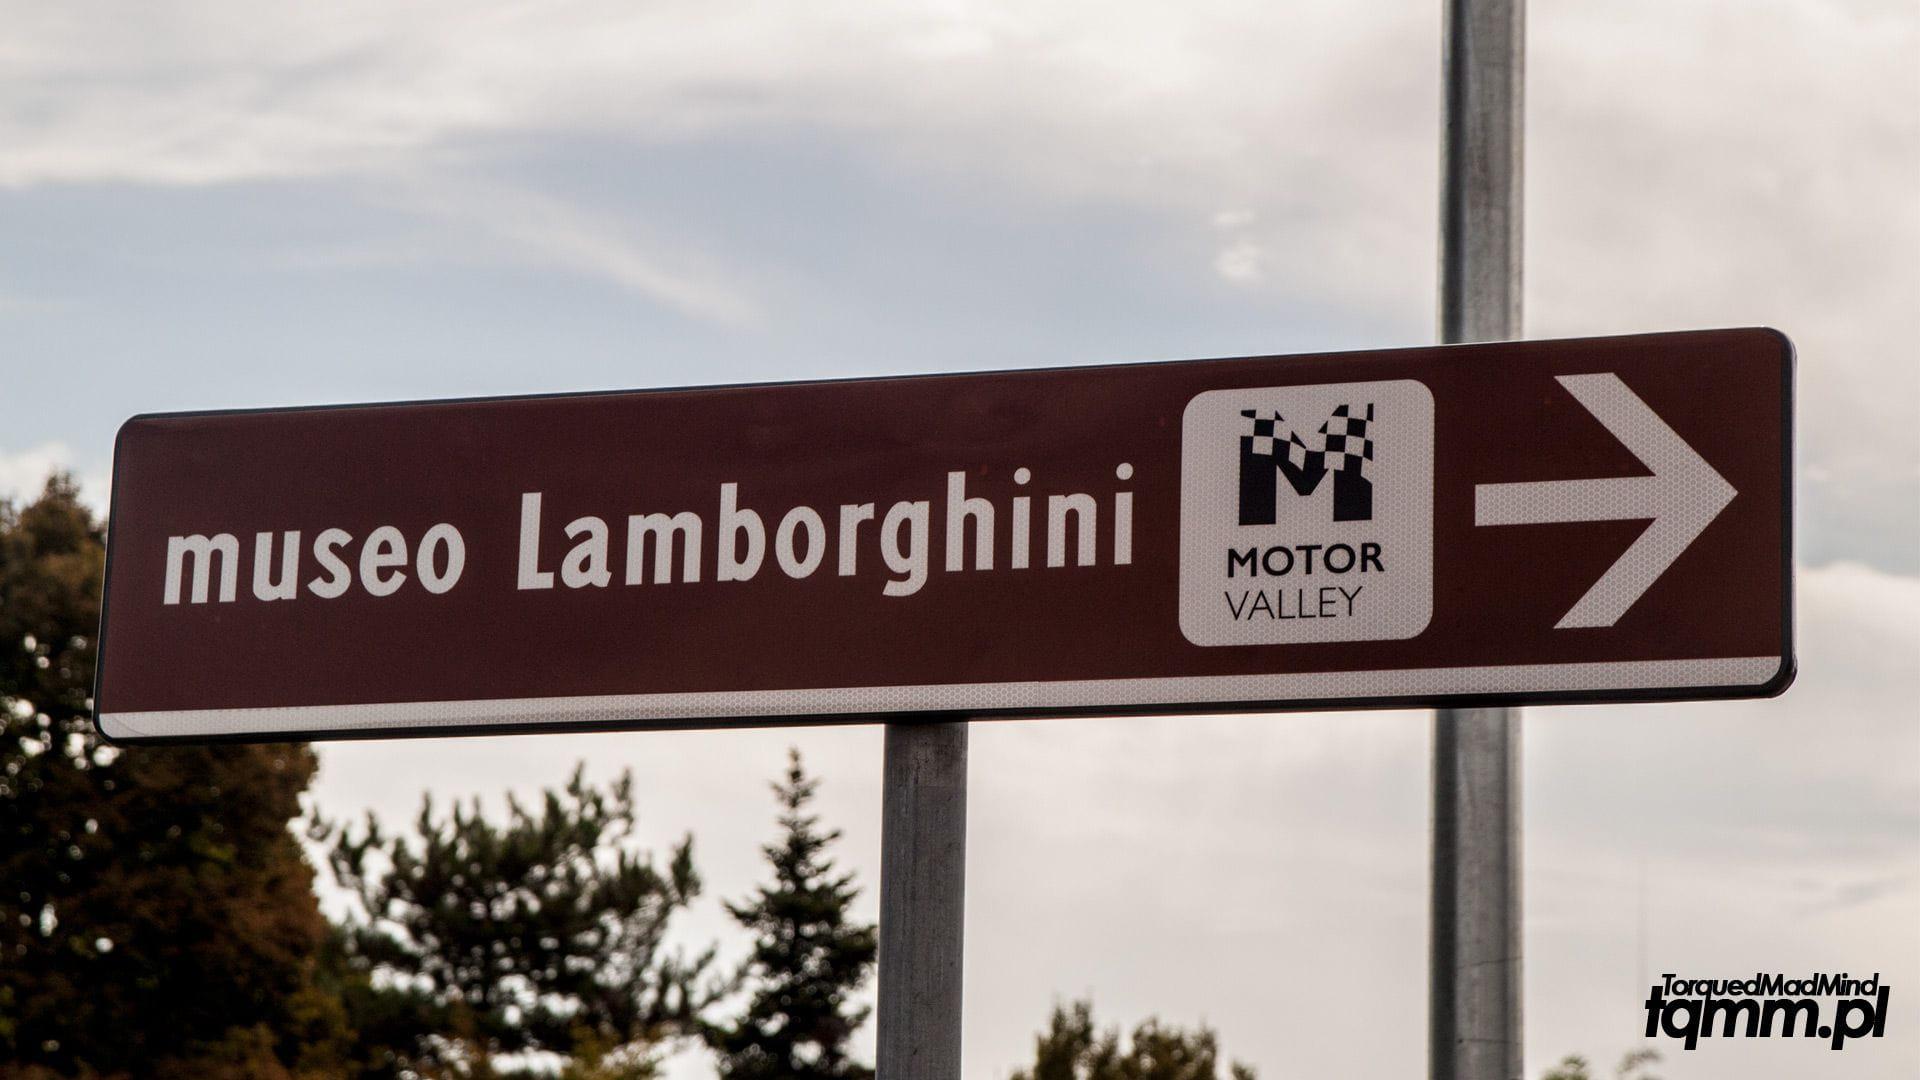 Fotki #96: Museo Lamborghini